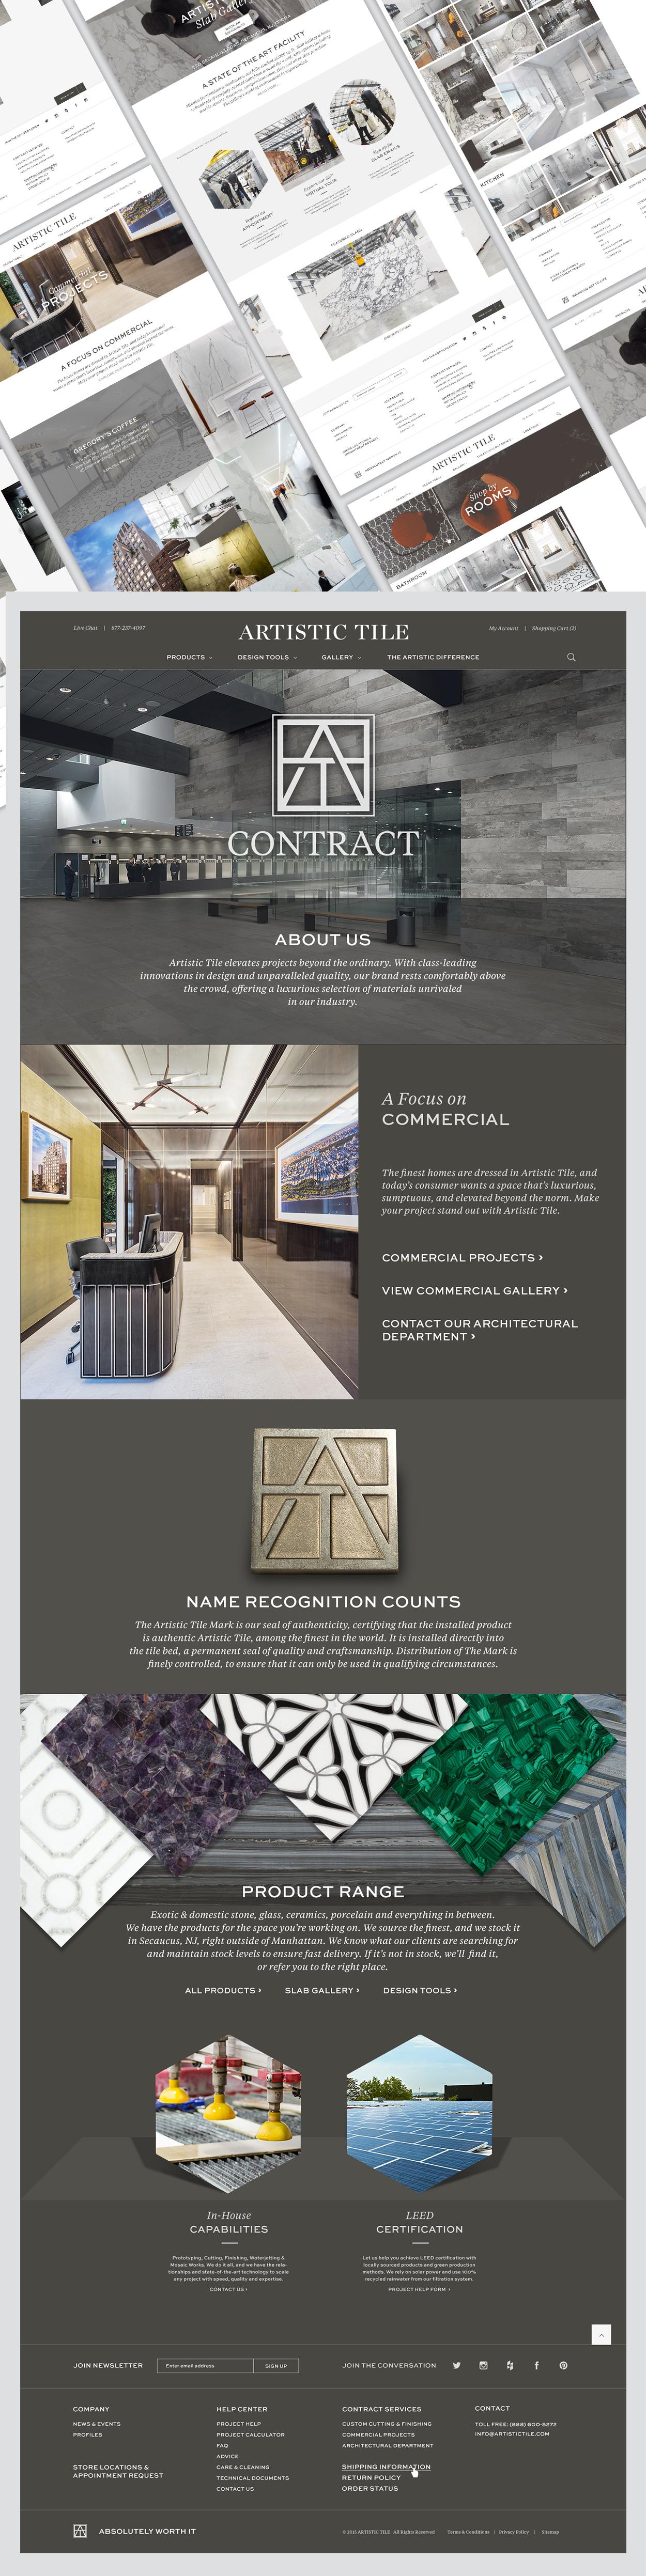 web design artistic tile portfolio